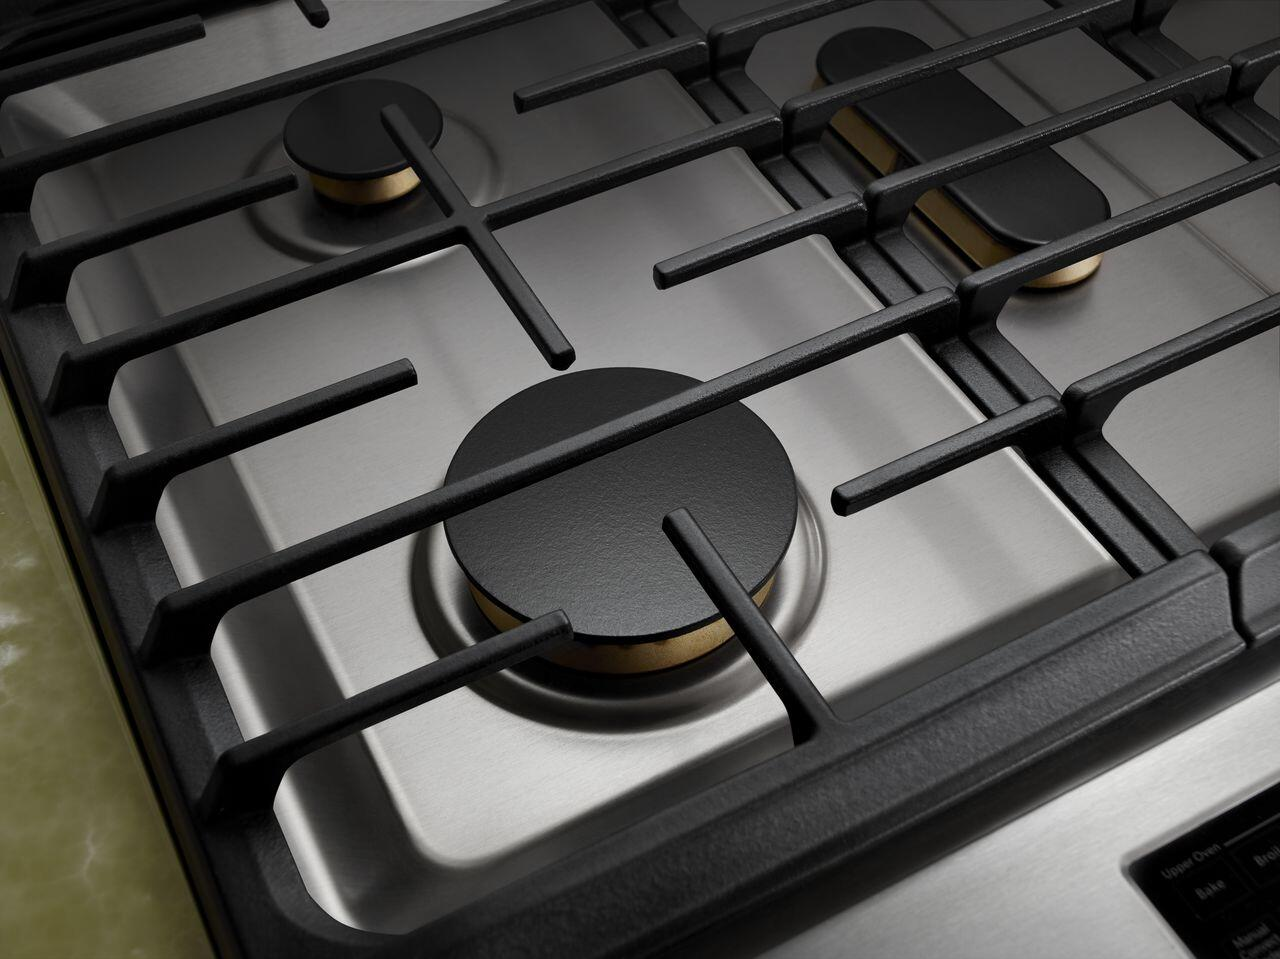 Jenn air deals jds1450ds 30 inch slide in dual fuel range for Kitchen 0 finance deals